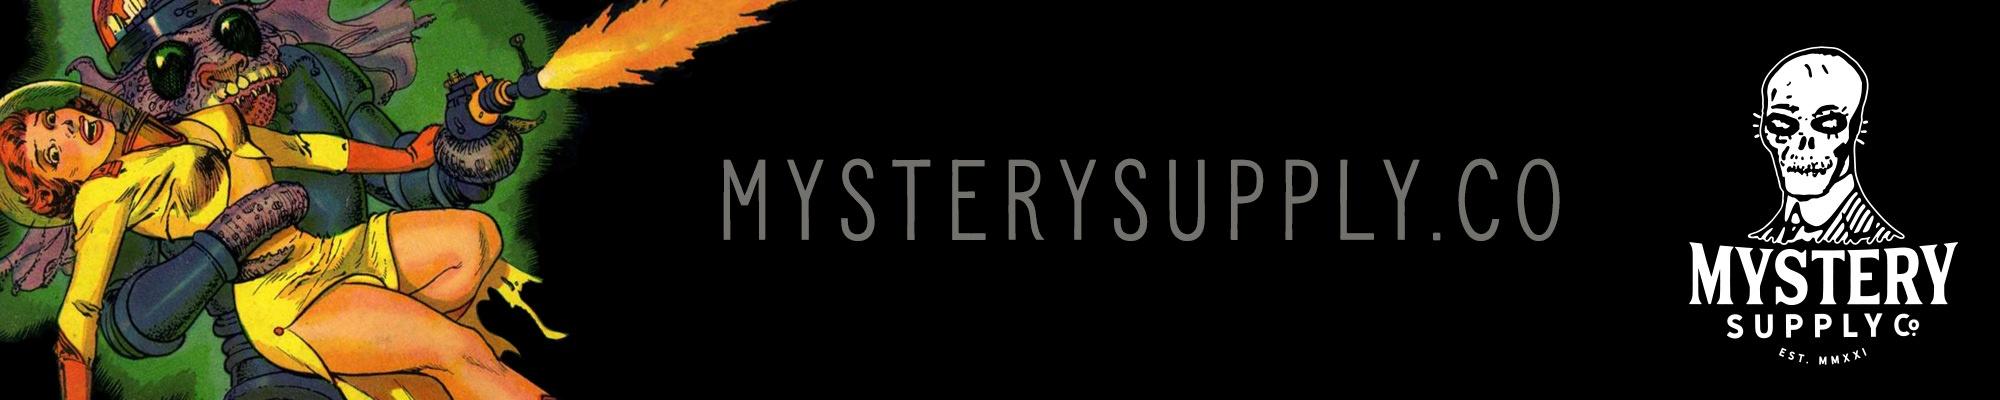 mysterysupplyco Cover